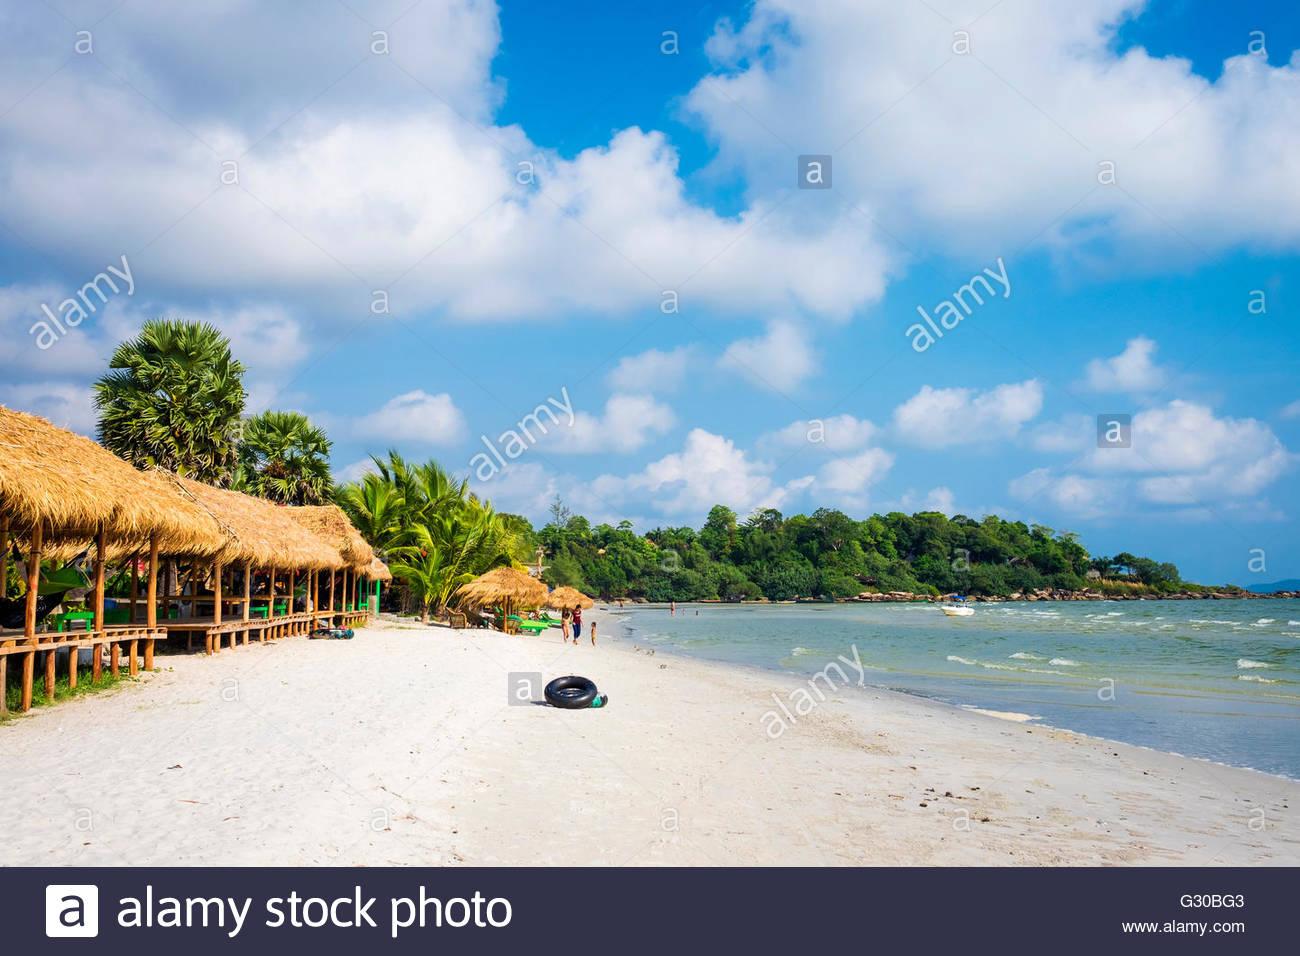 Thatched huts with hammocks along Ochheuteal Beach, Sihanoukville, Preah Sihanouk Province, Cambodia, Indochina, - Stock Image